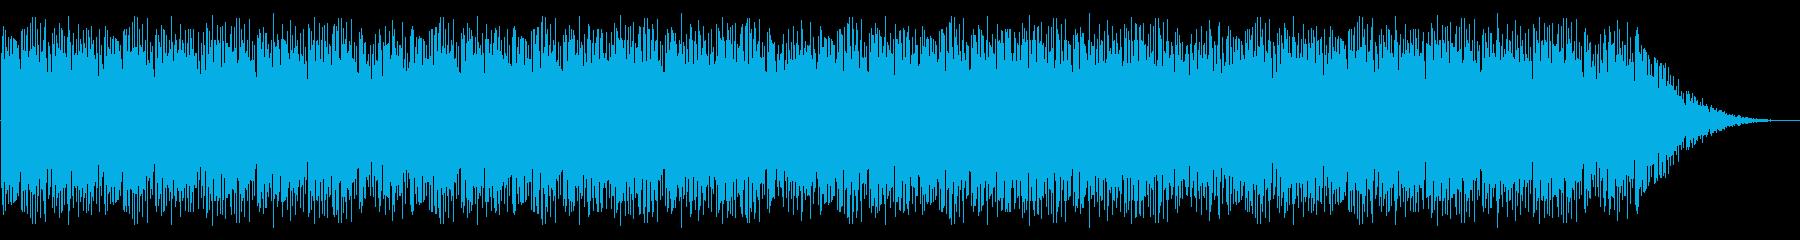 NES STG C05-1(ボス) の再生済みの波形